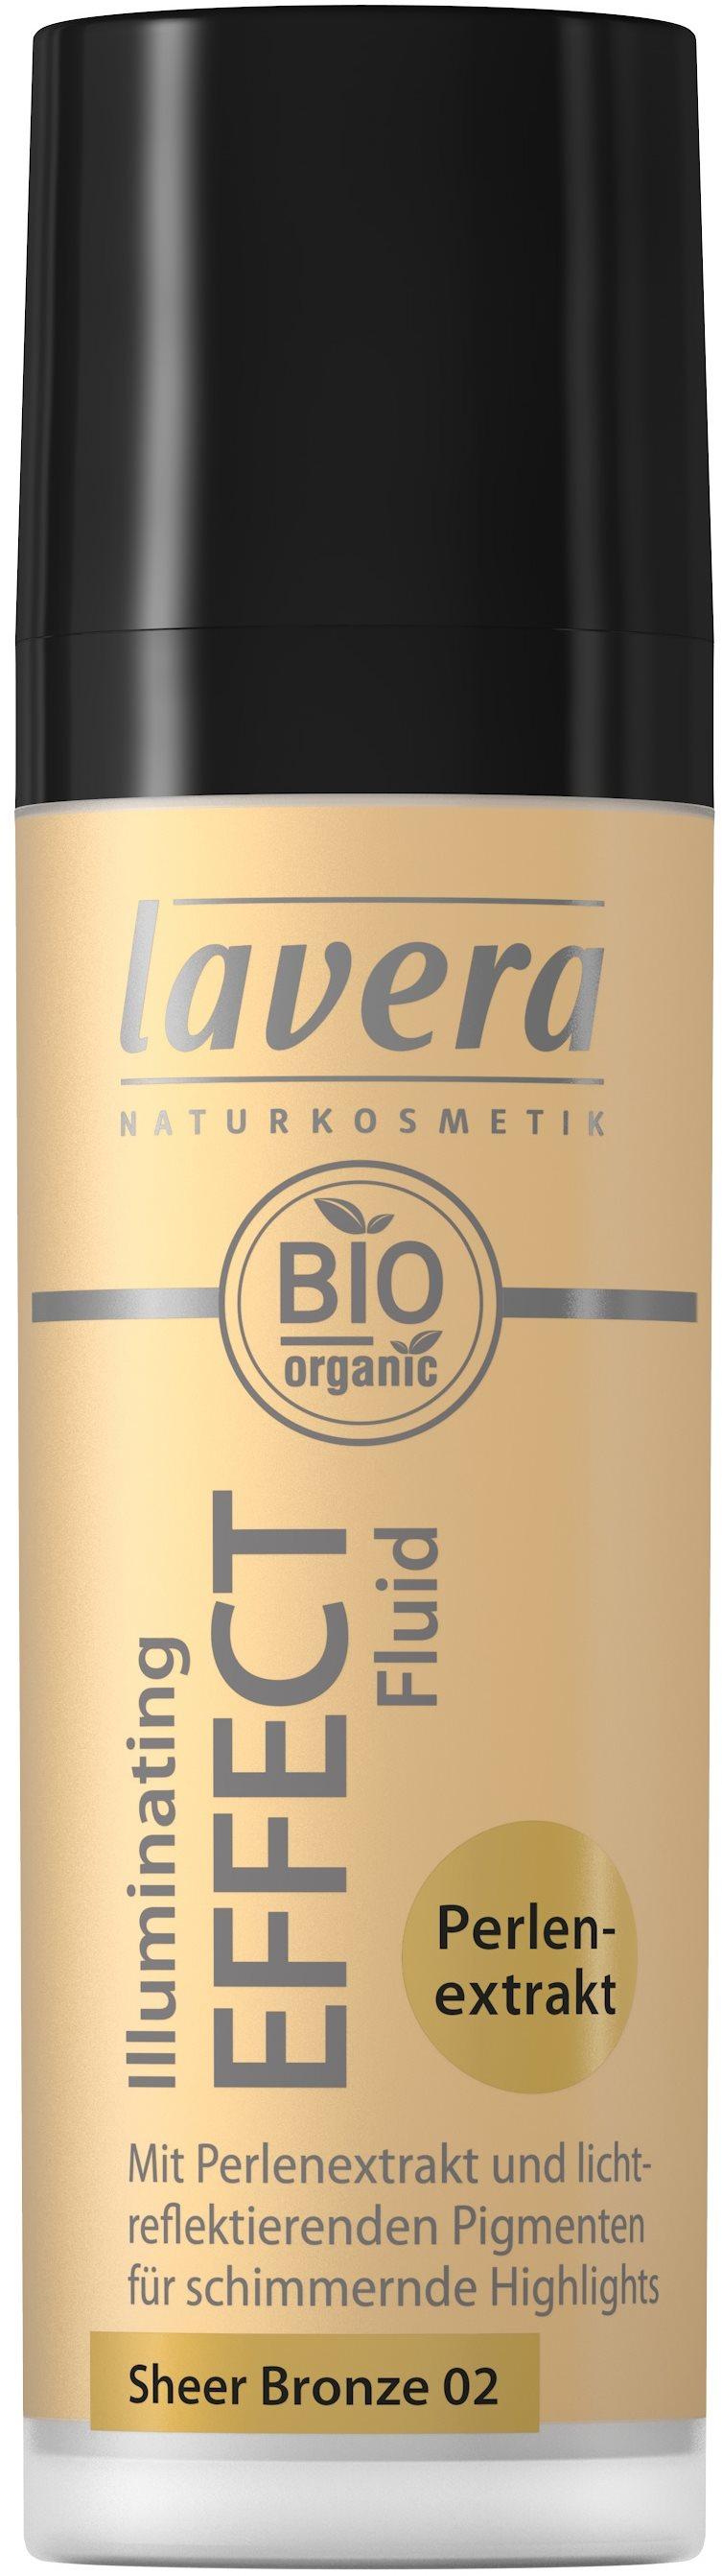 LAVERA Illuminating Effect Fluid Sheer Bronze 02 30 ml